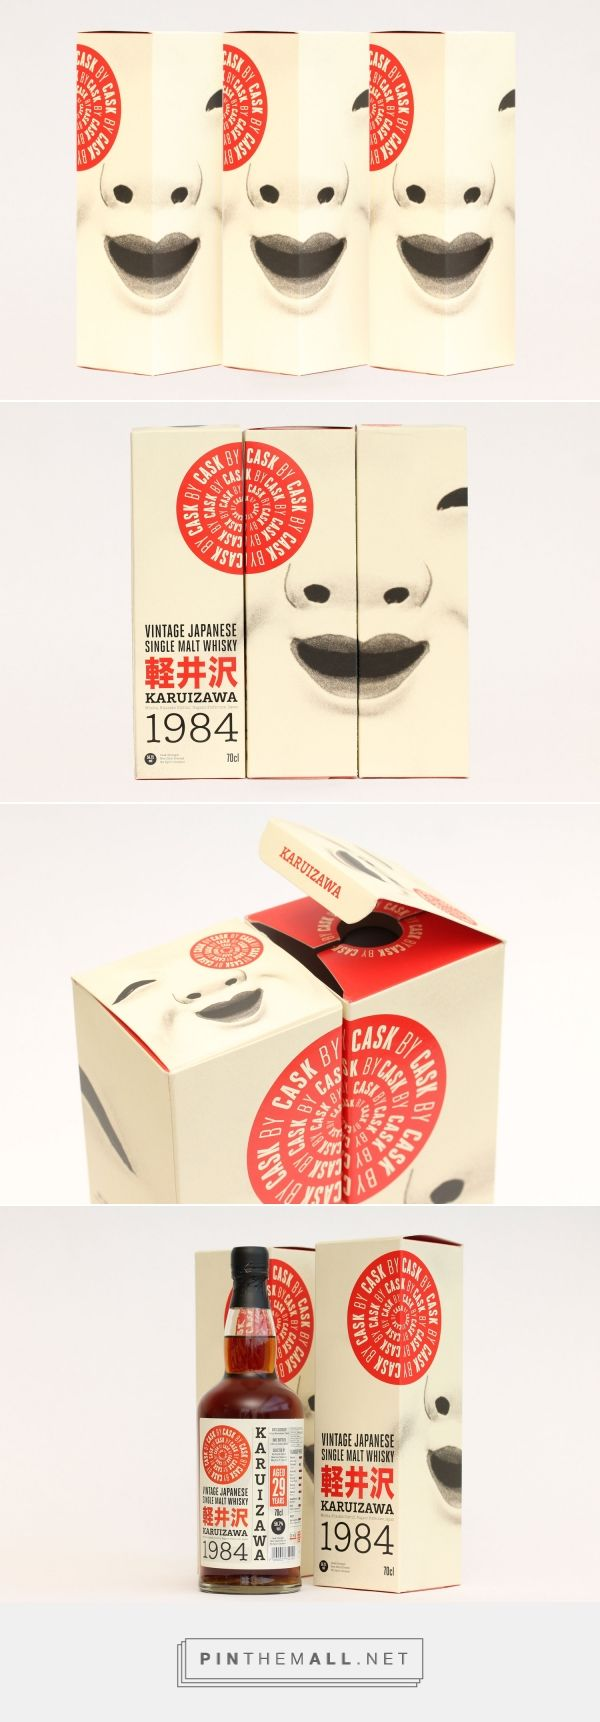 Karuizawa - Vintage Japanese Single Malt Whisky